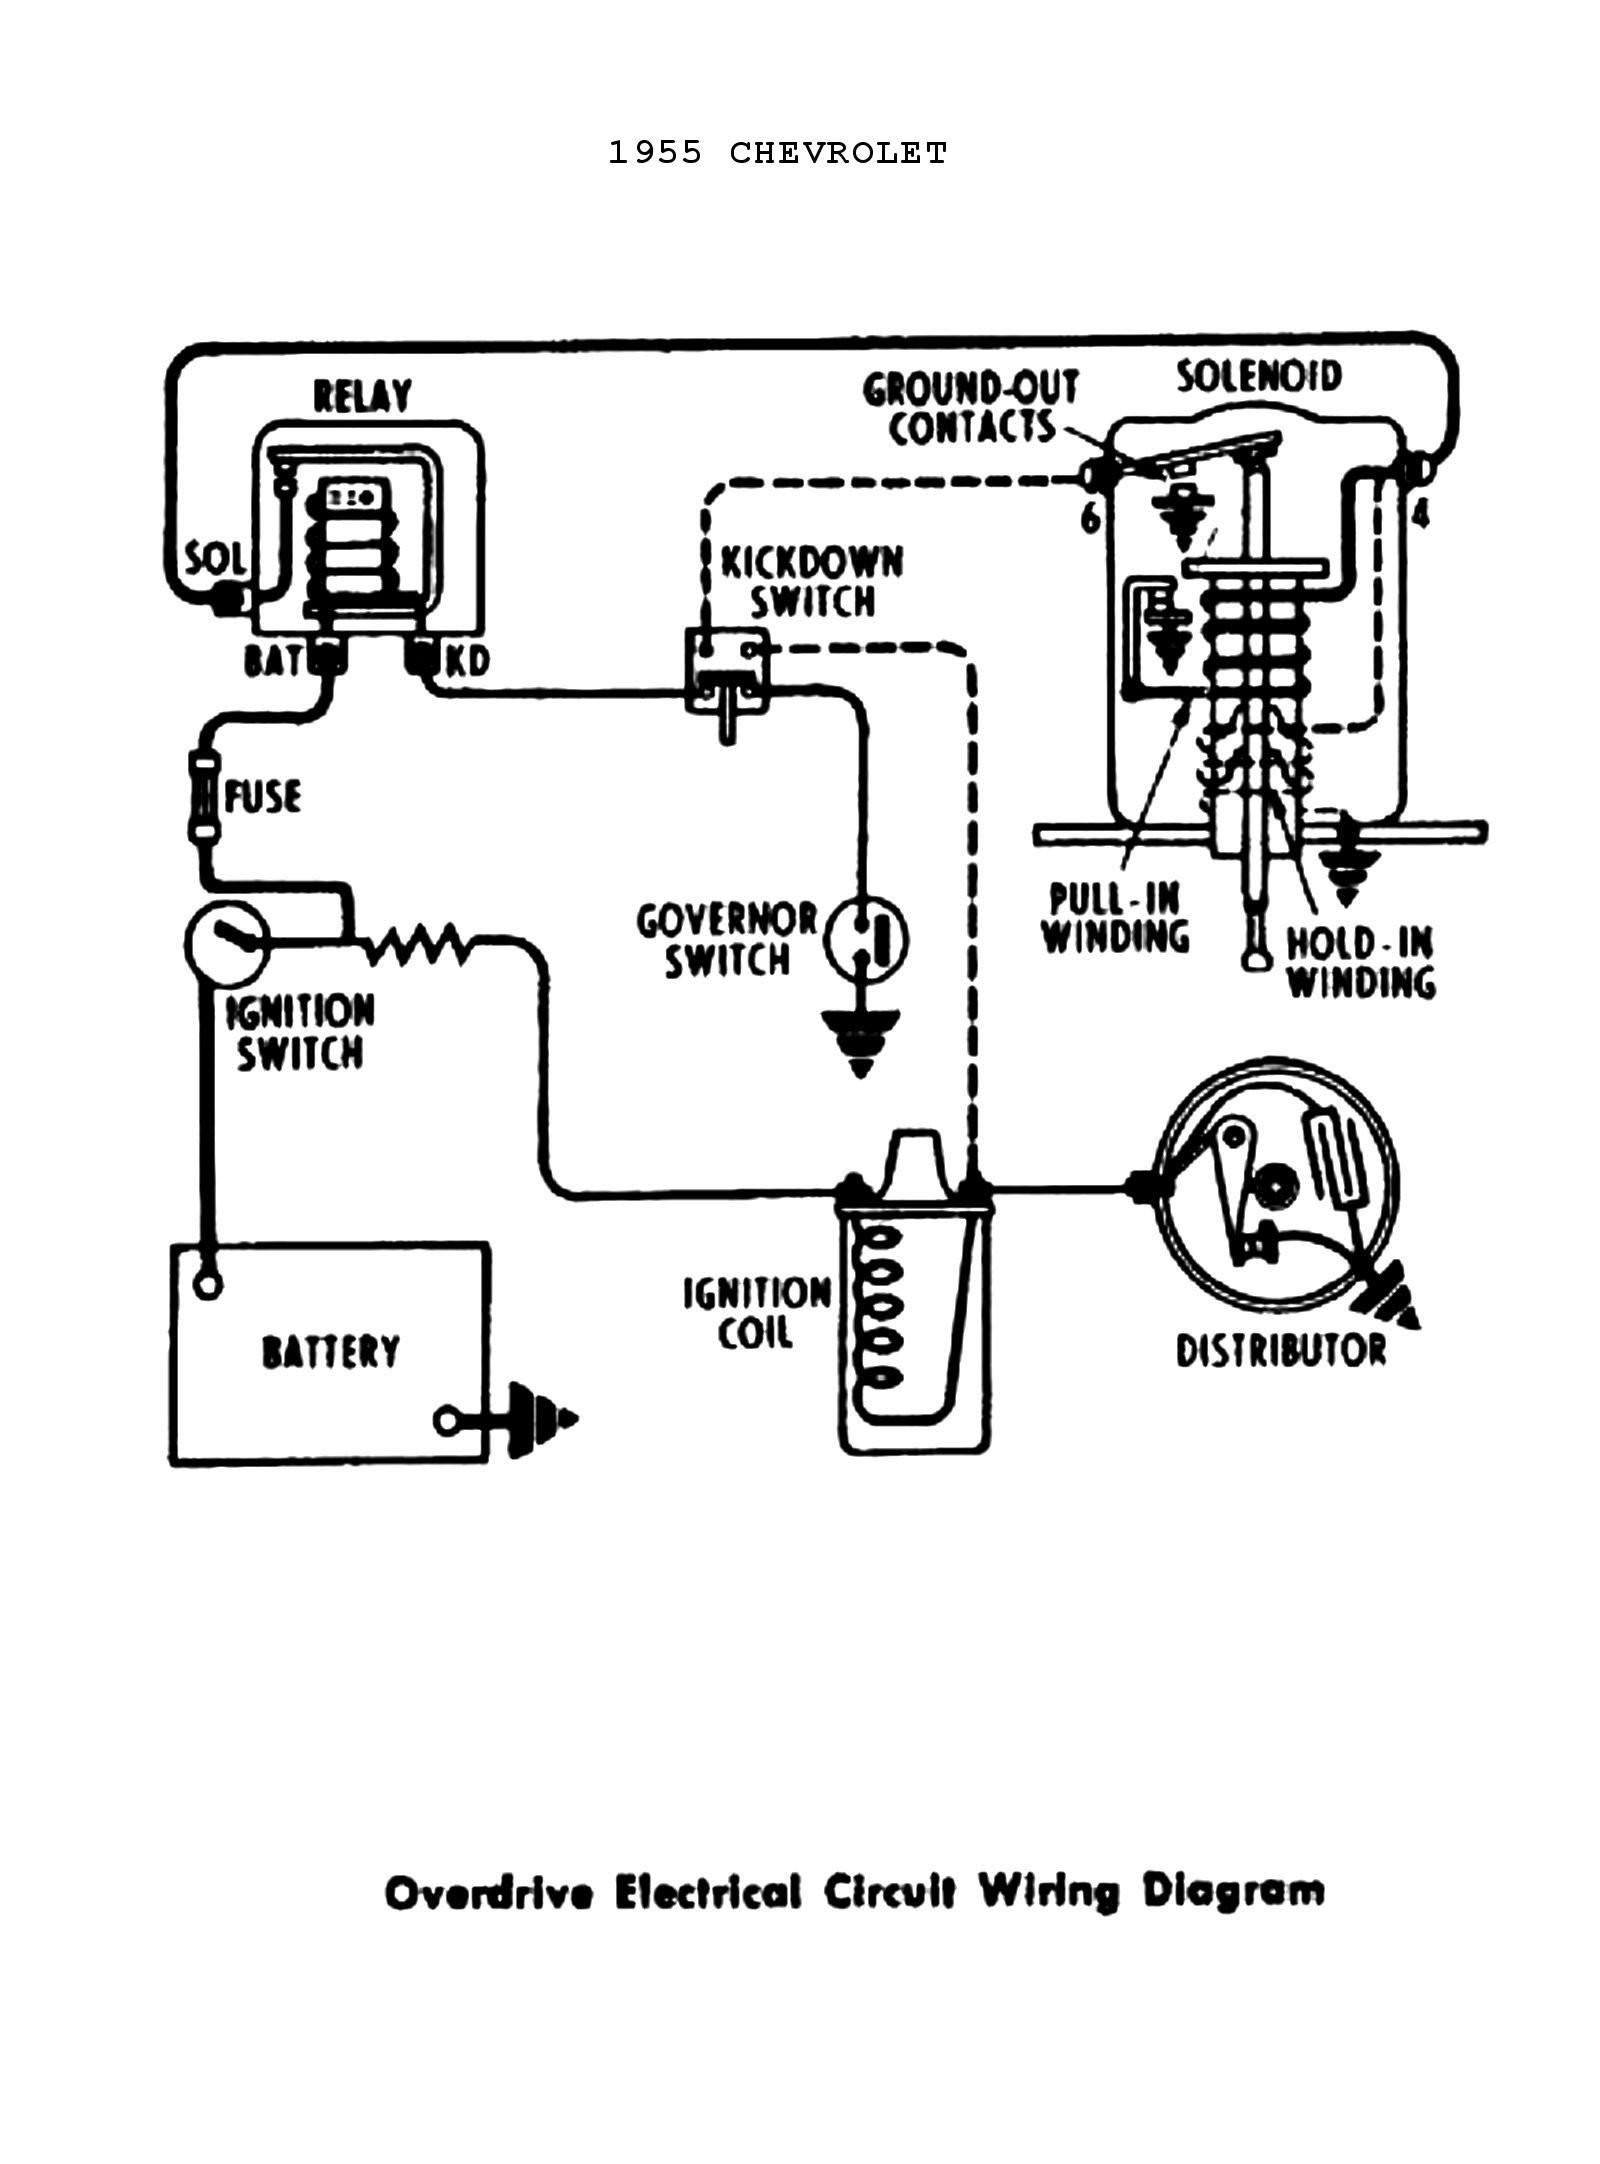 diagram of coil ignition system car ignition system wiring diagram rh detoxicrecenze com car ignition diagram car ignition circuit diagram